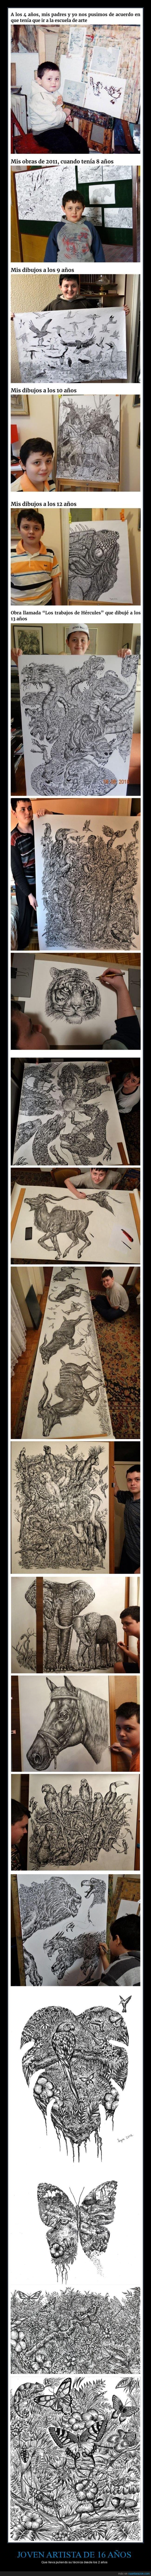 artista,dibujante,dibujos,dusan krtolica